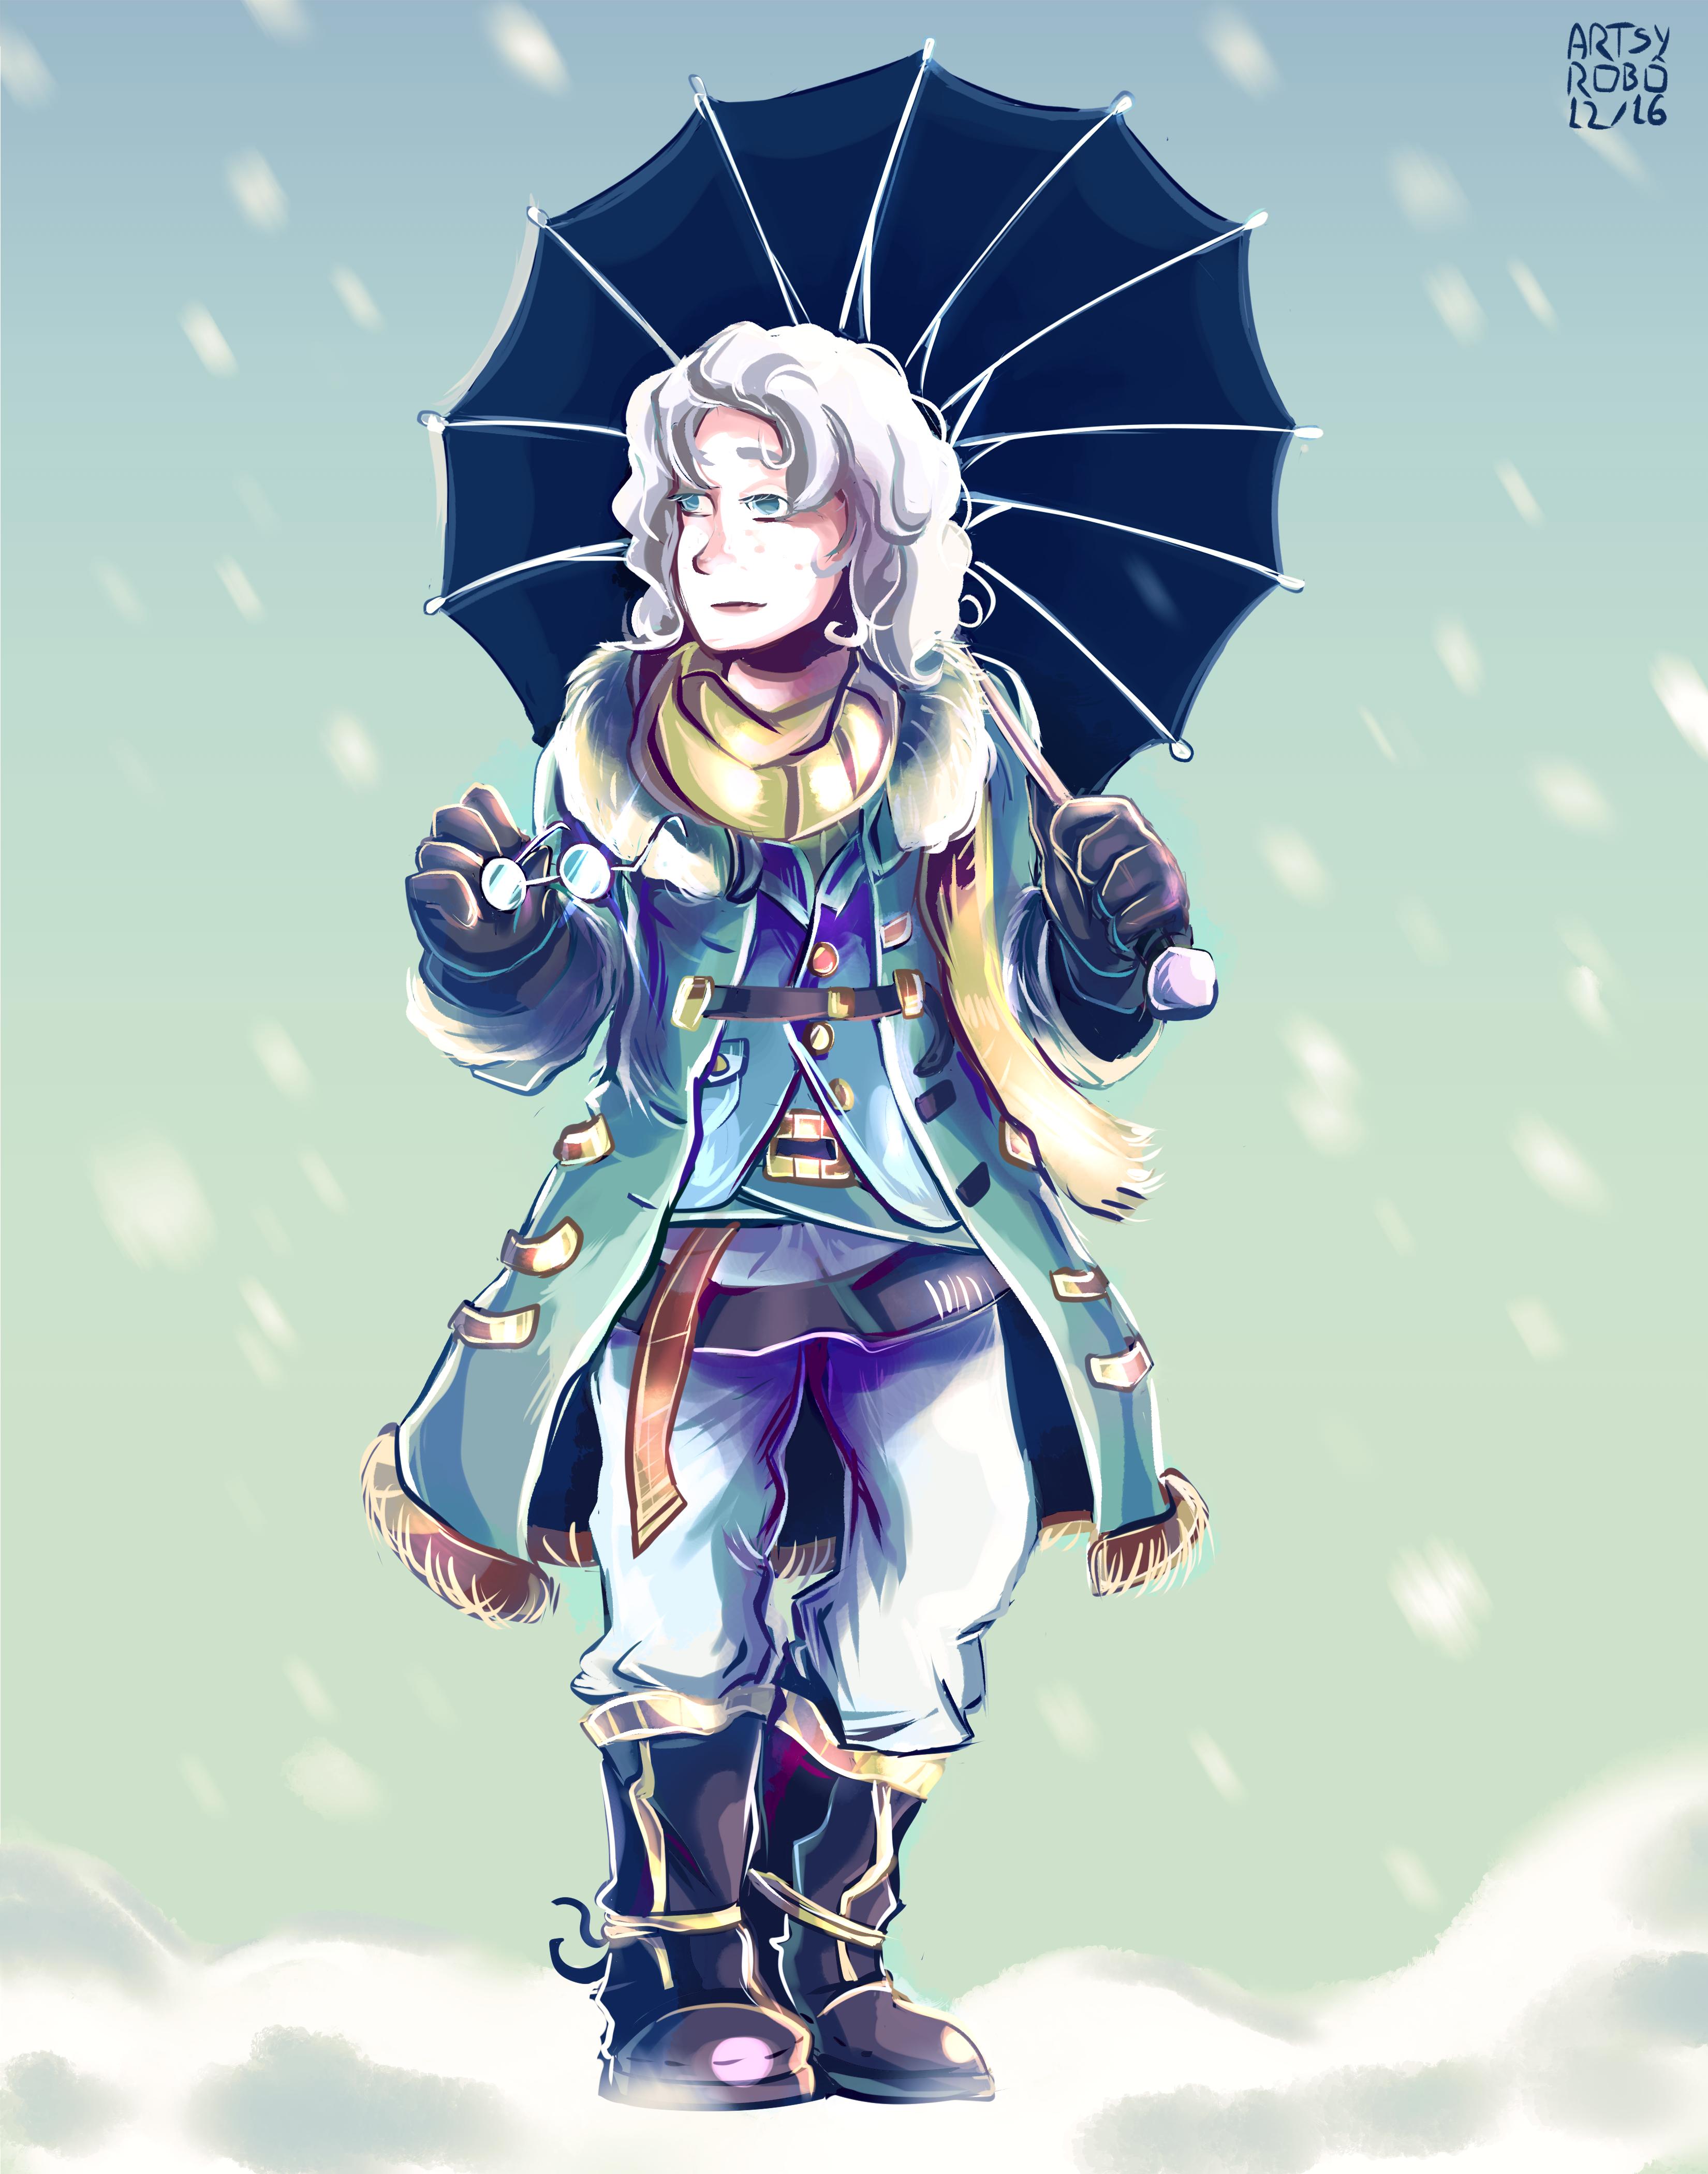 Kulfi Kulikov standing in snow